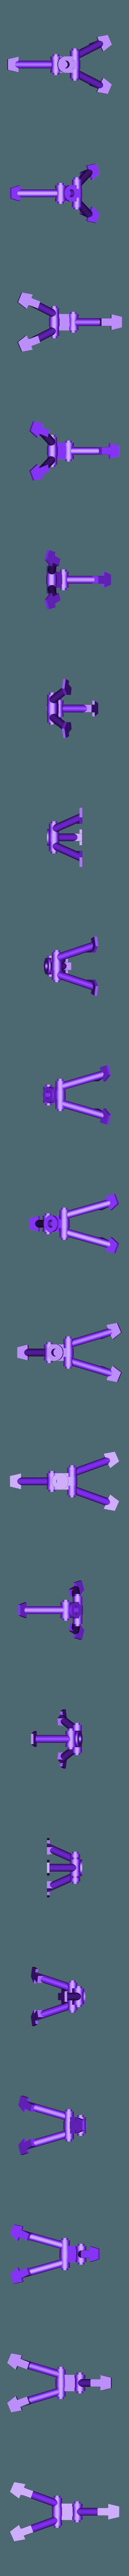 HWT_Tripod.stl Download free STL file Lascannon (Heavy weapon team) • Model to 3D print, Solutionlesn